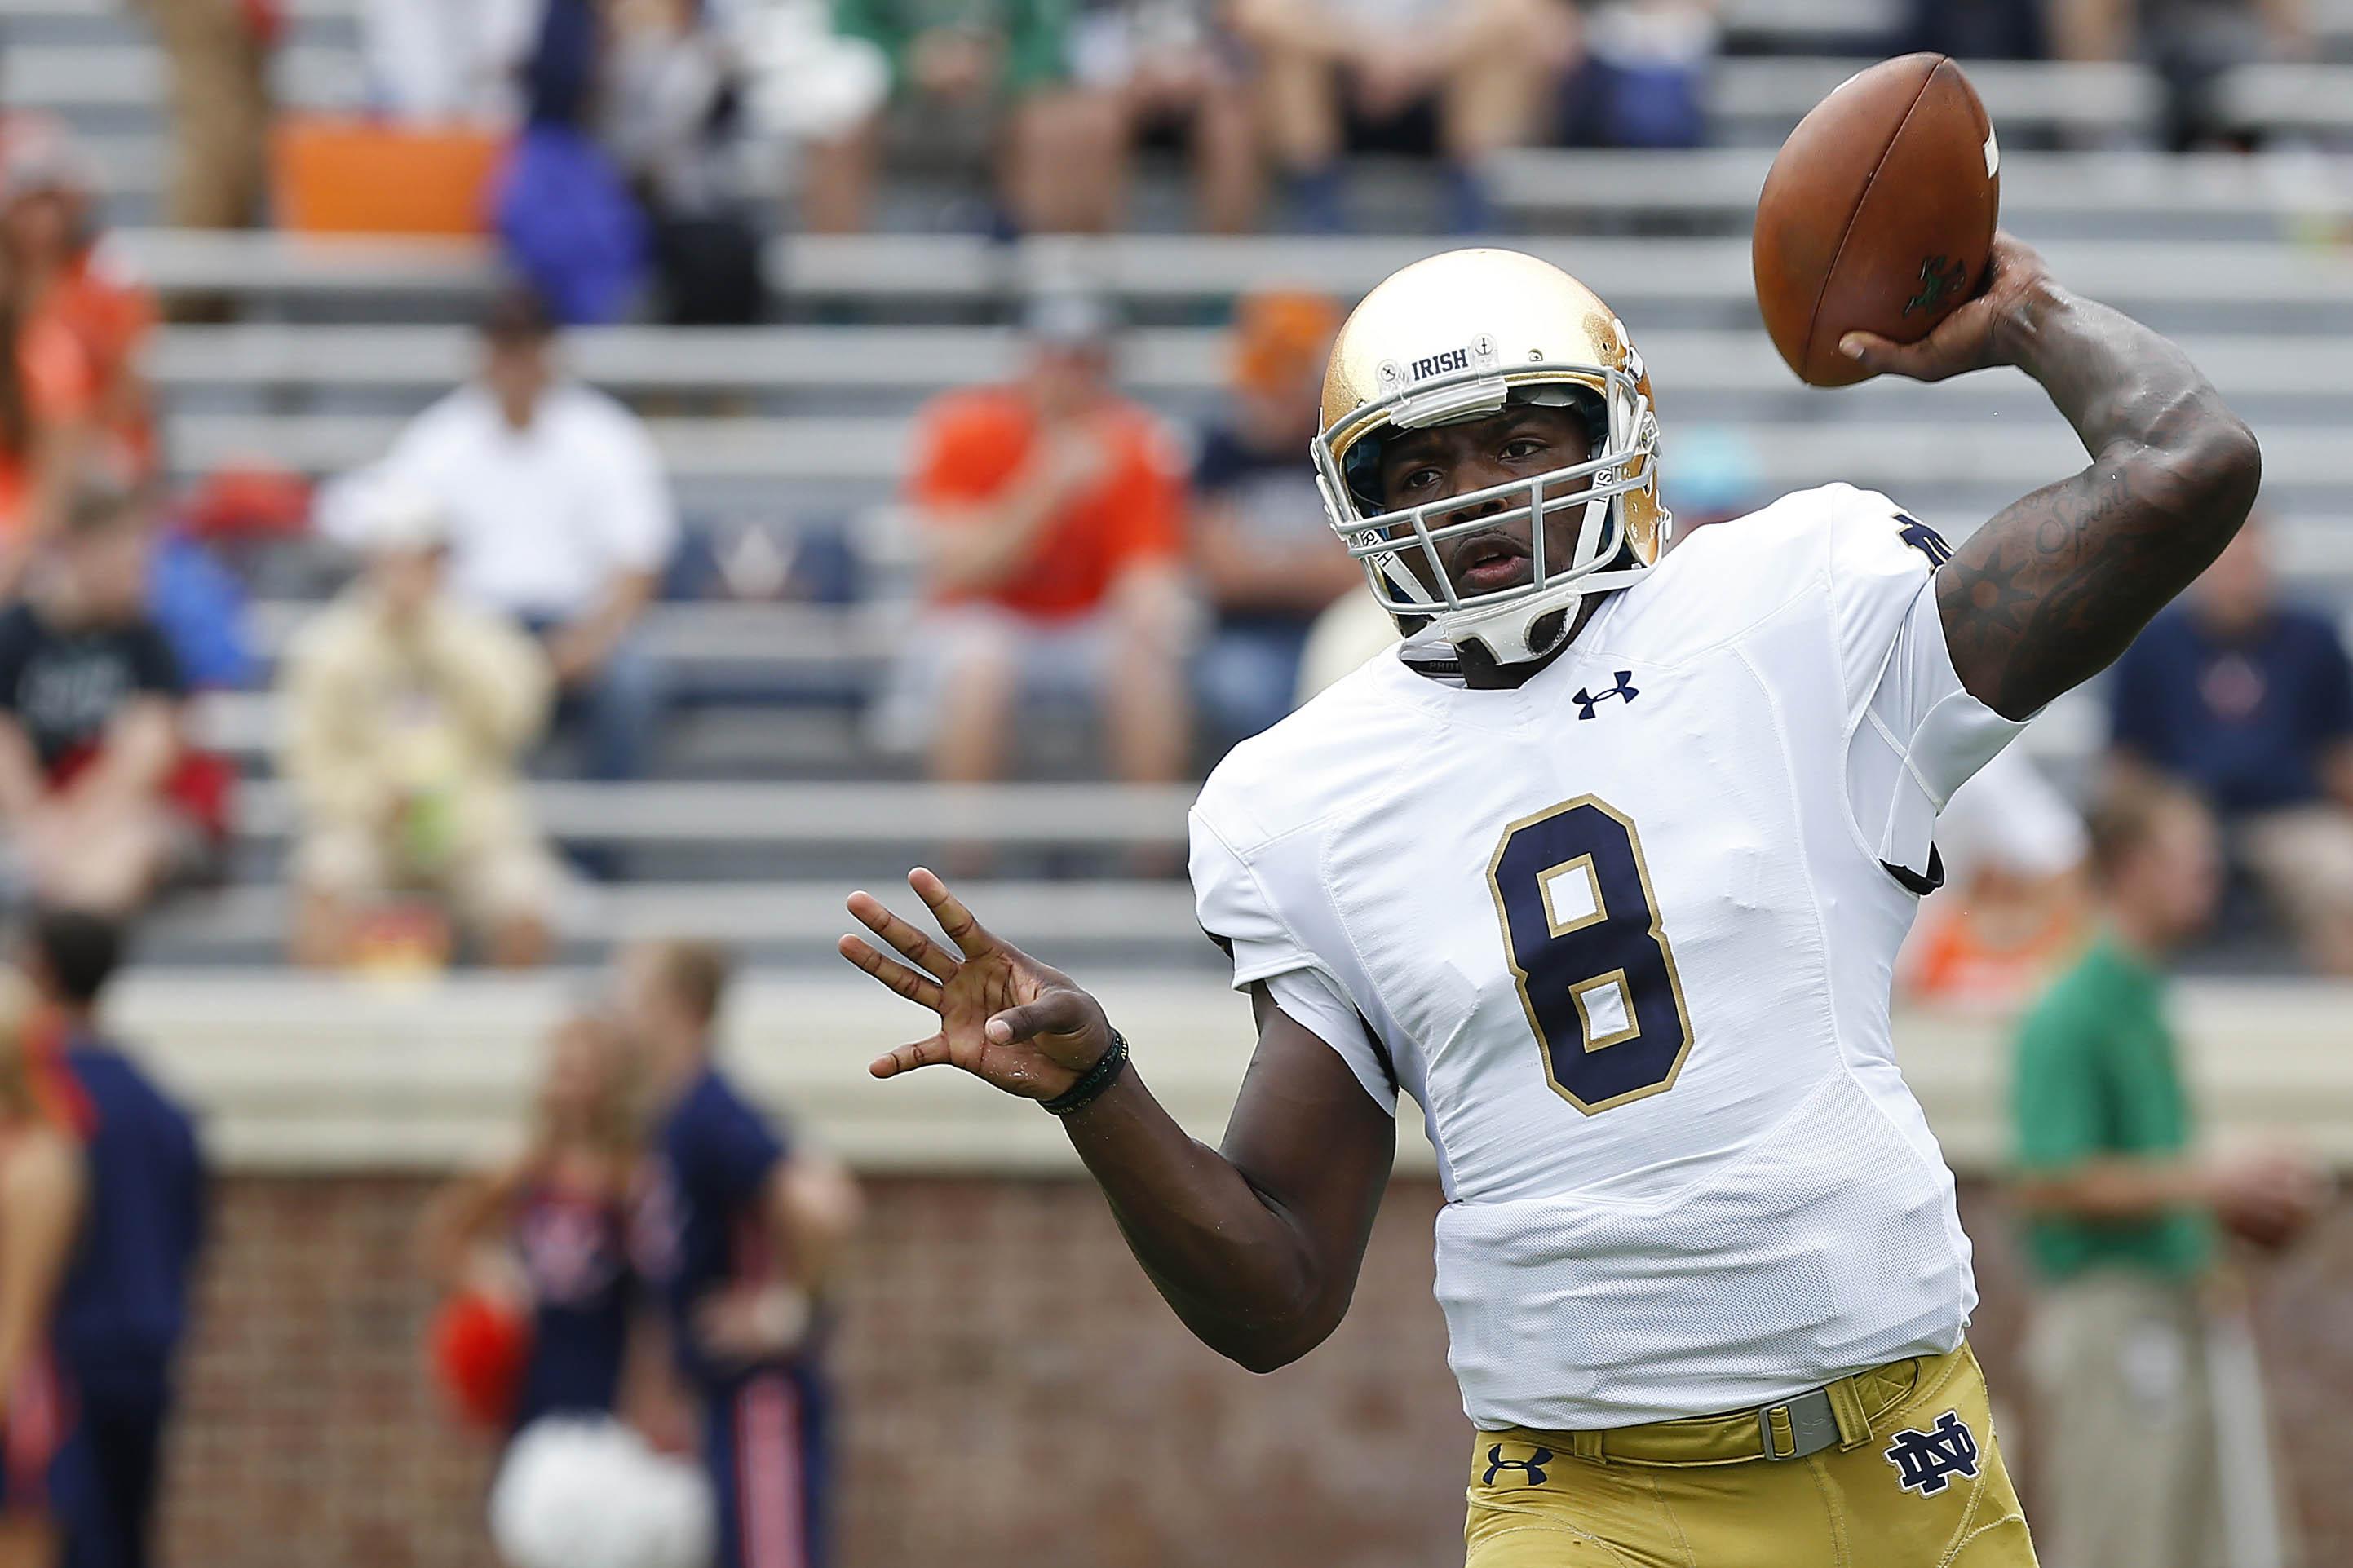 Notre Dame Football: We're still waiting on Malik Zaire's ...